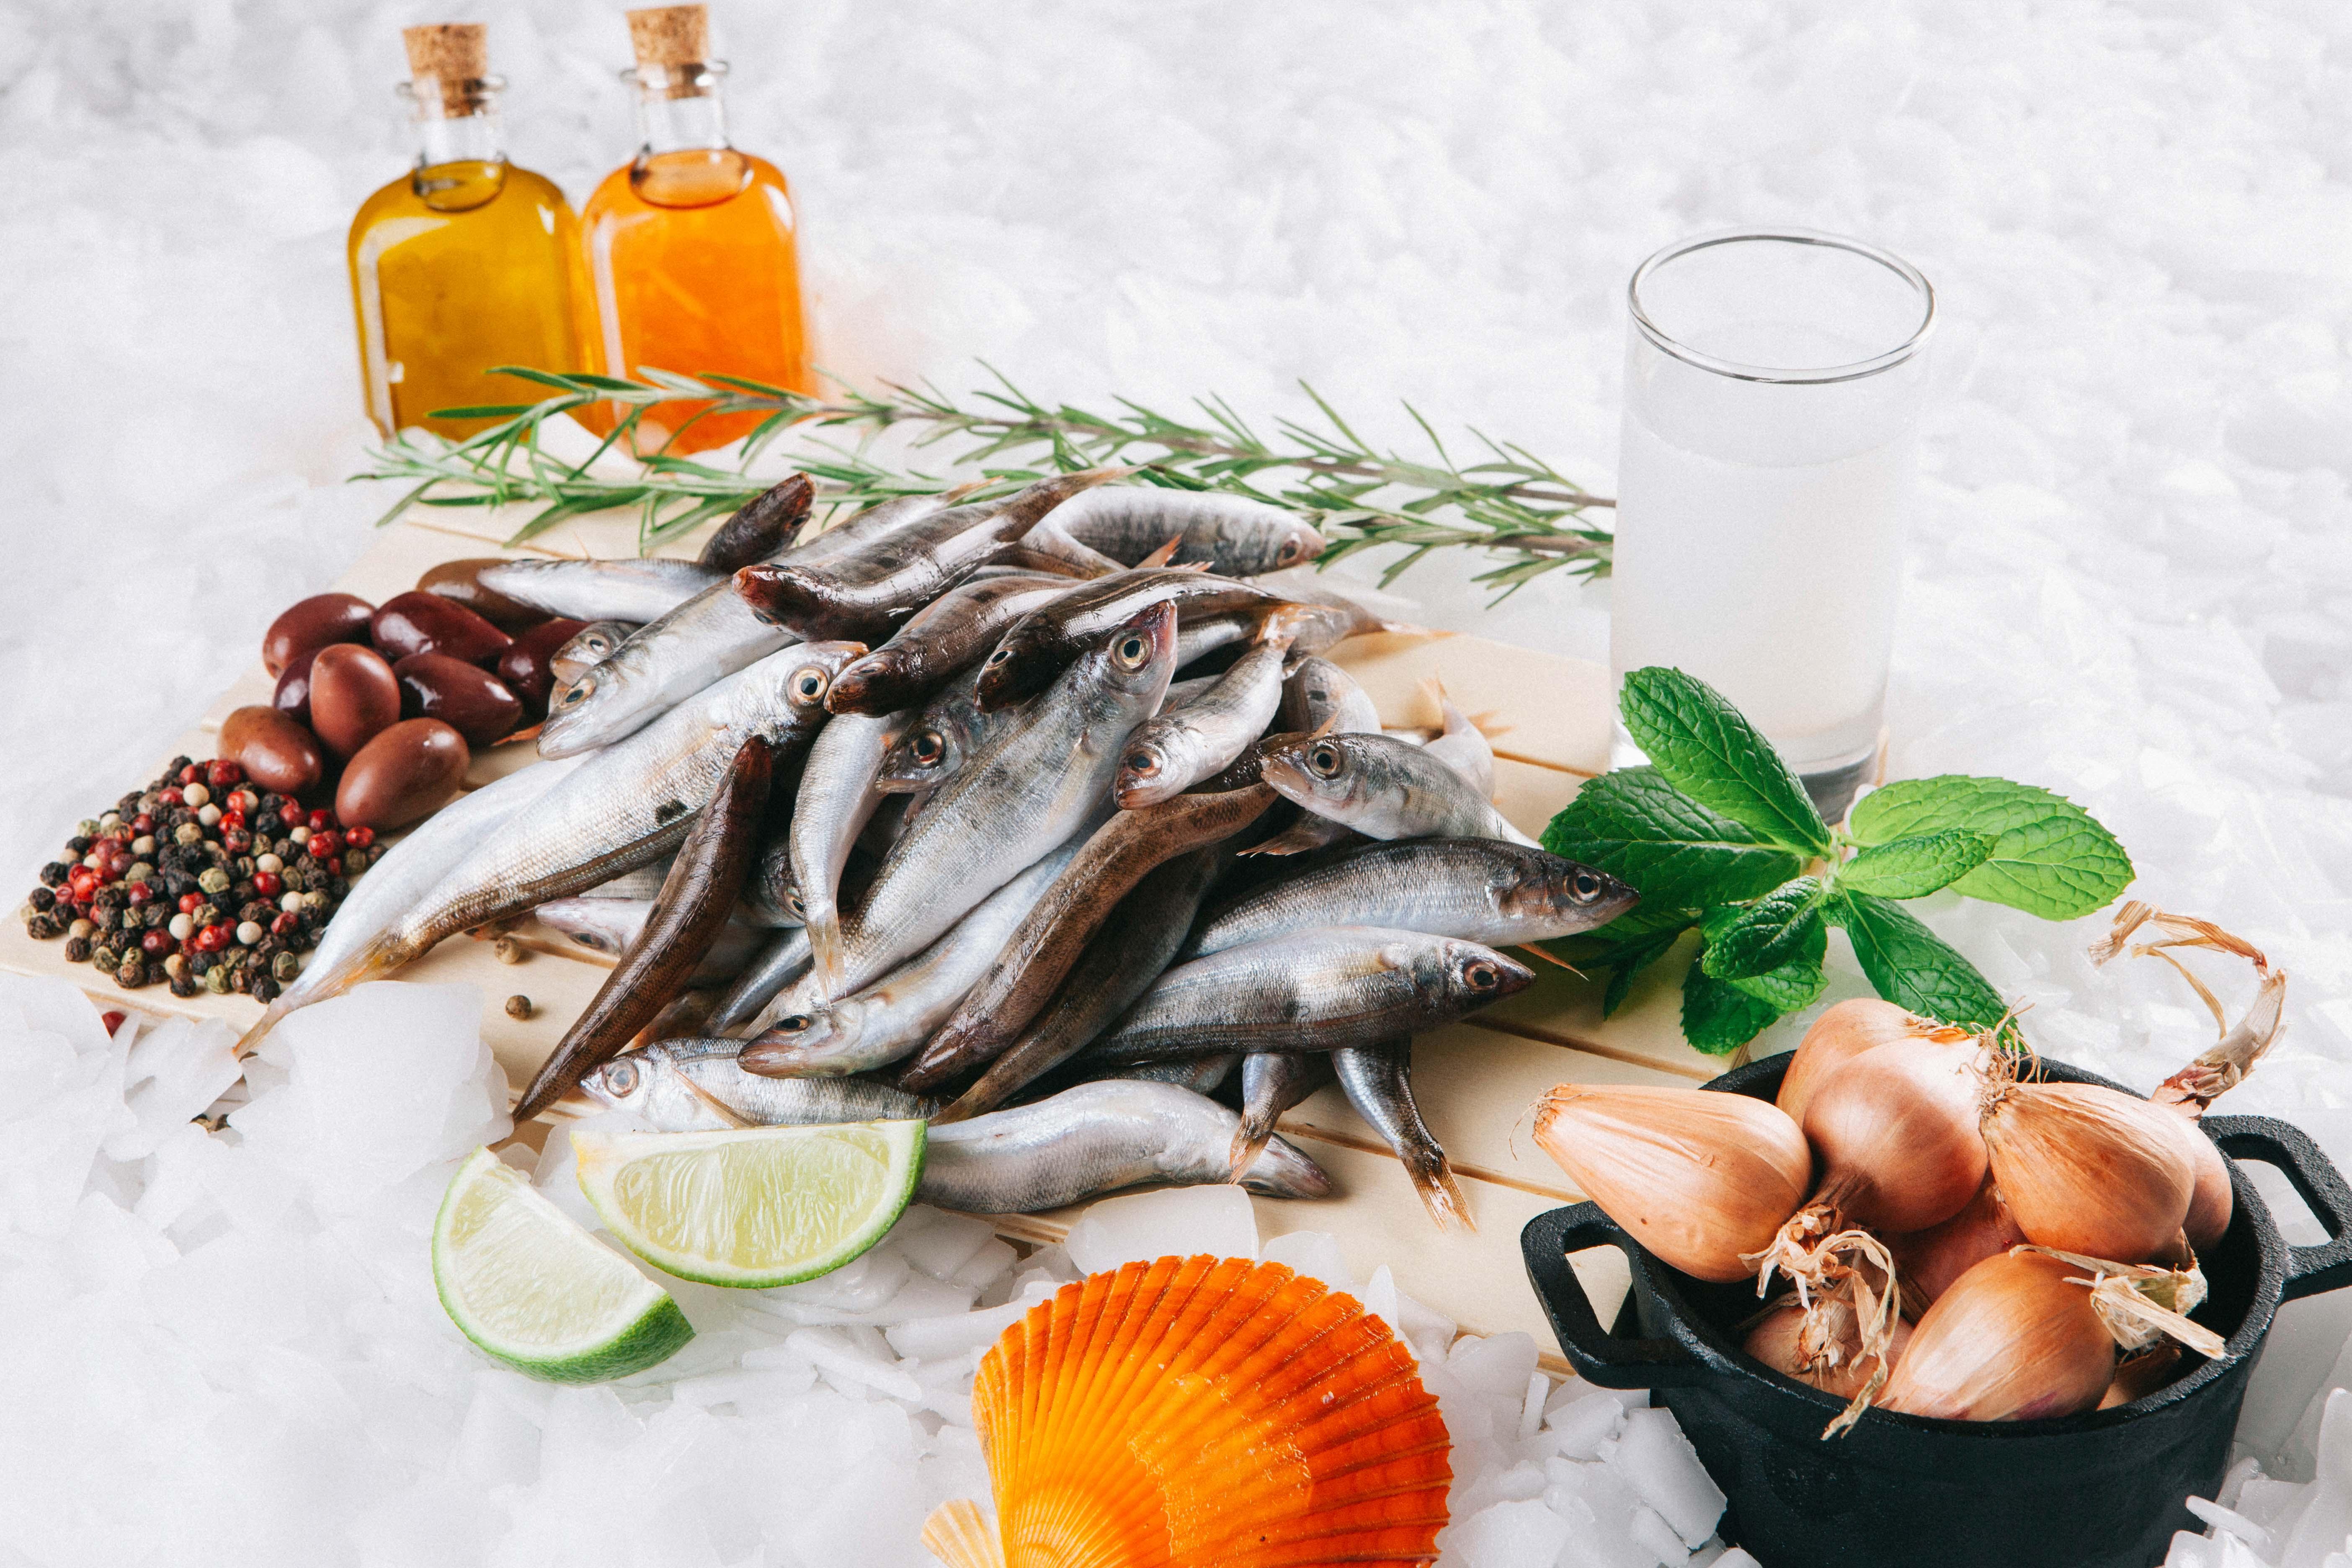 Supper Fish Μαρίδα Ελλάδος